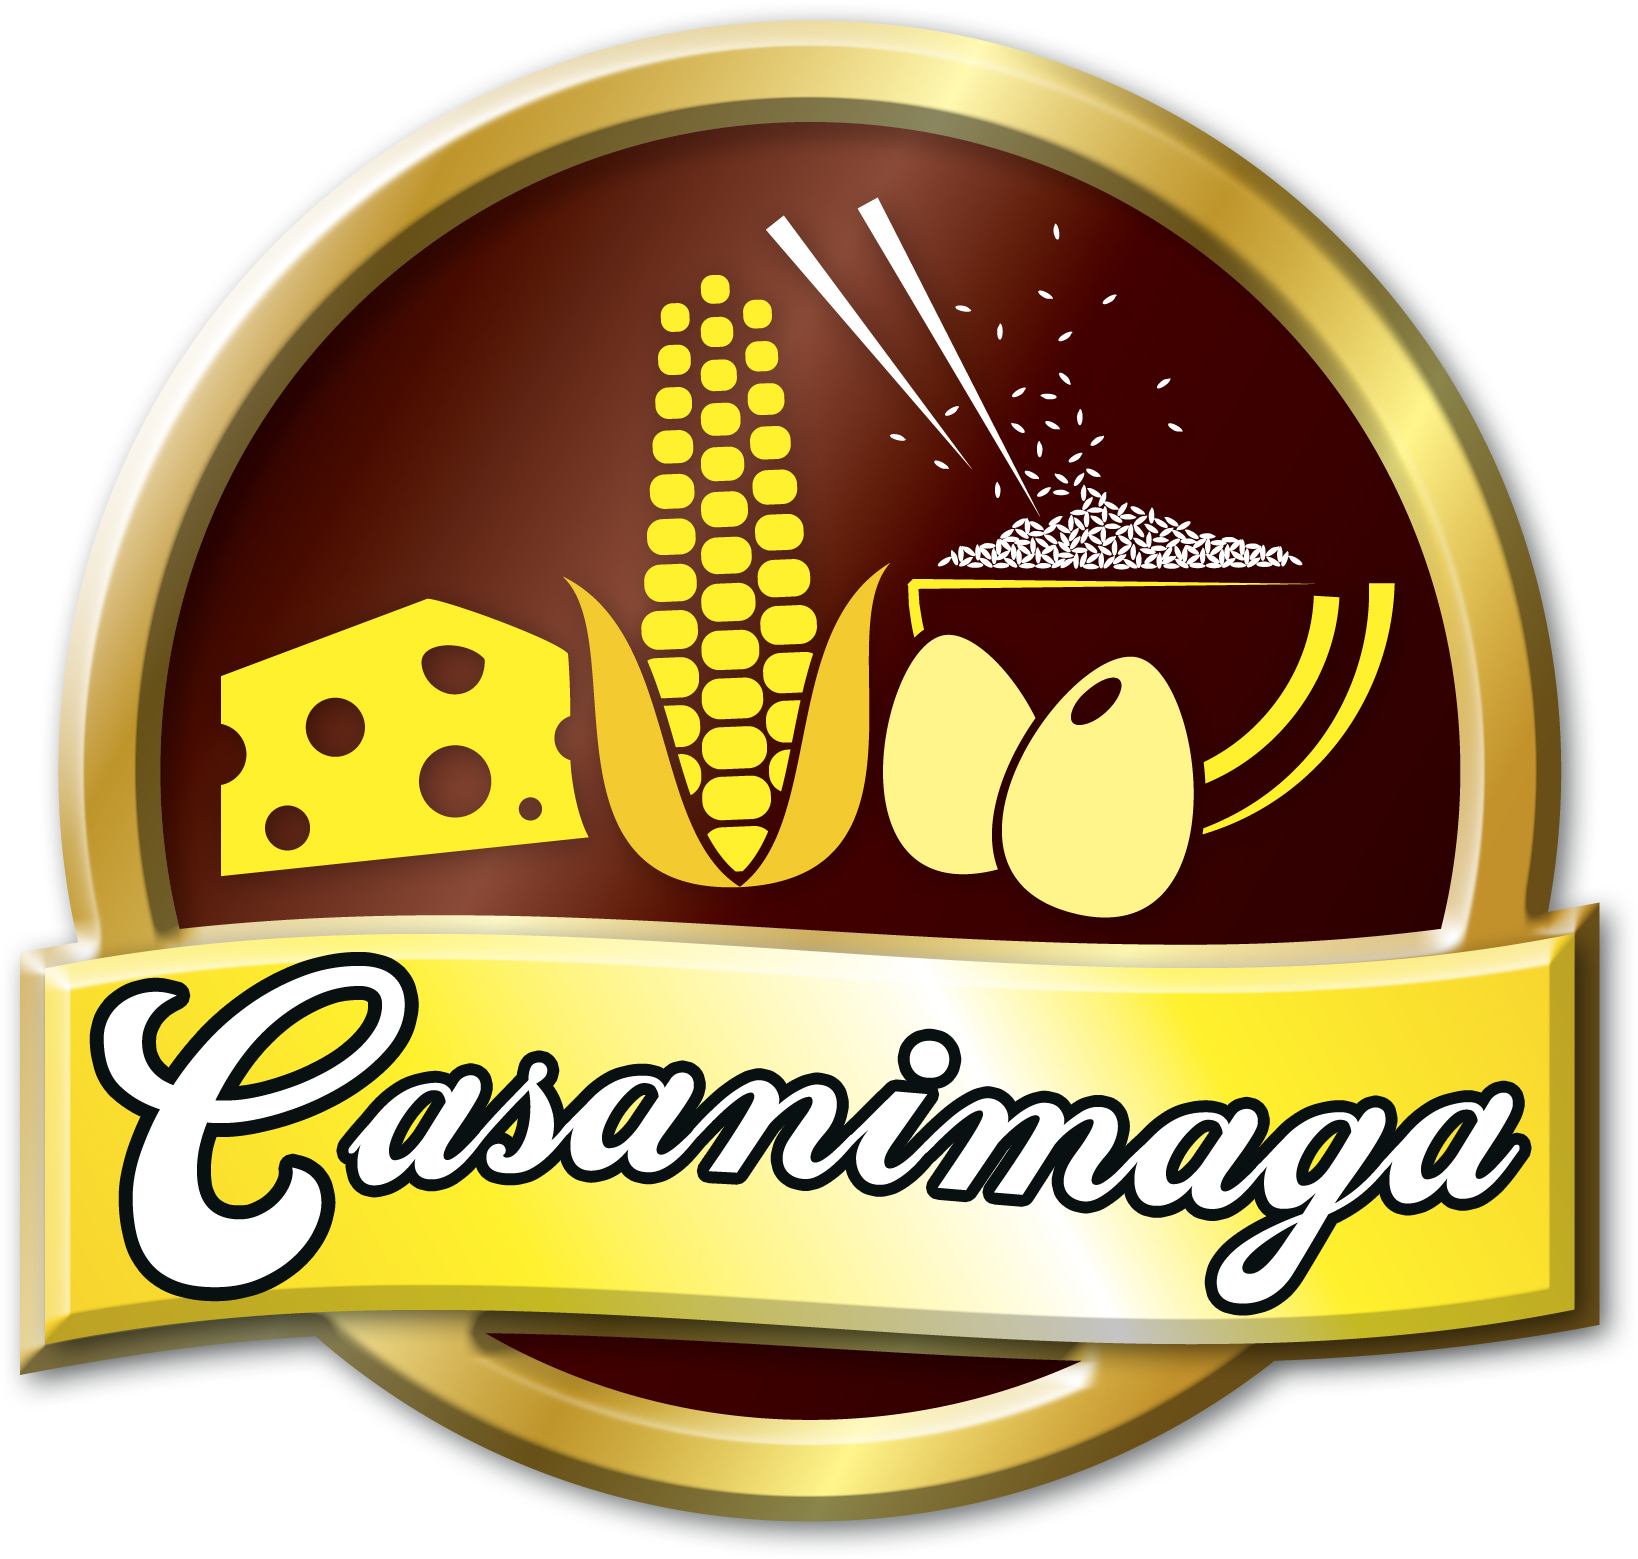 Organic Food Company Logos For Organic Food Company